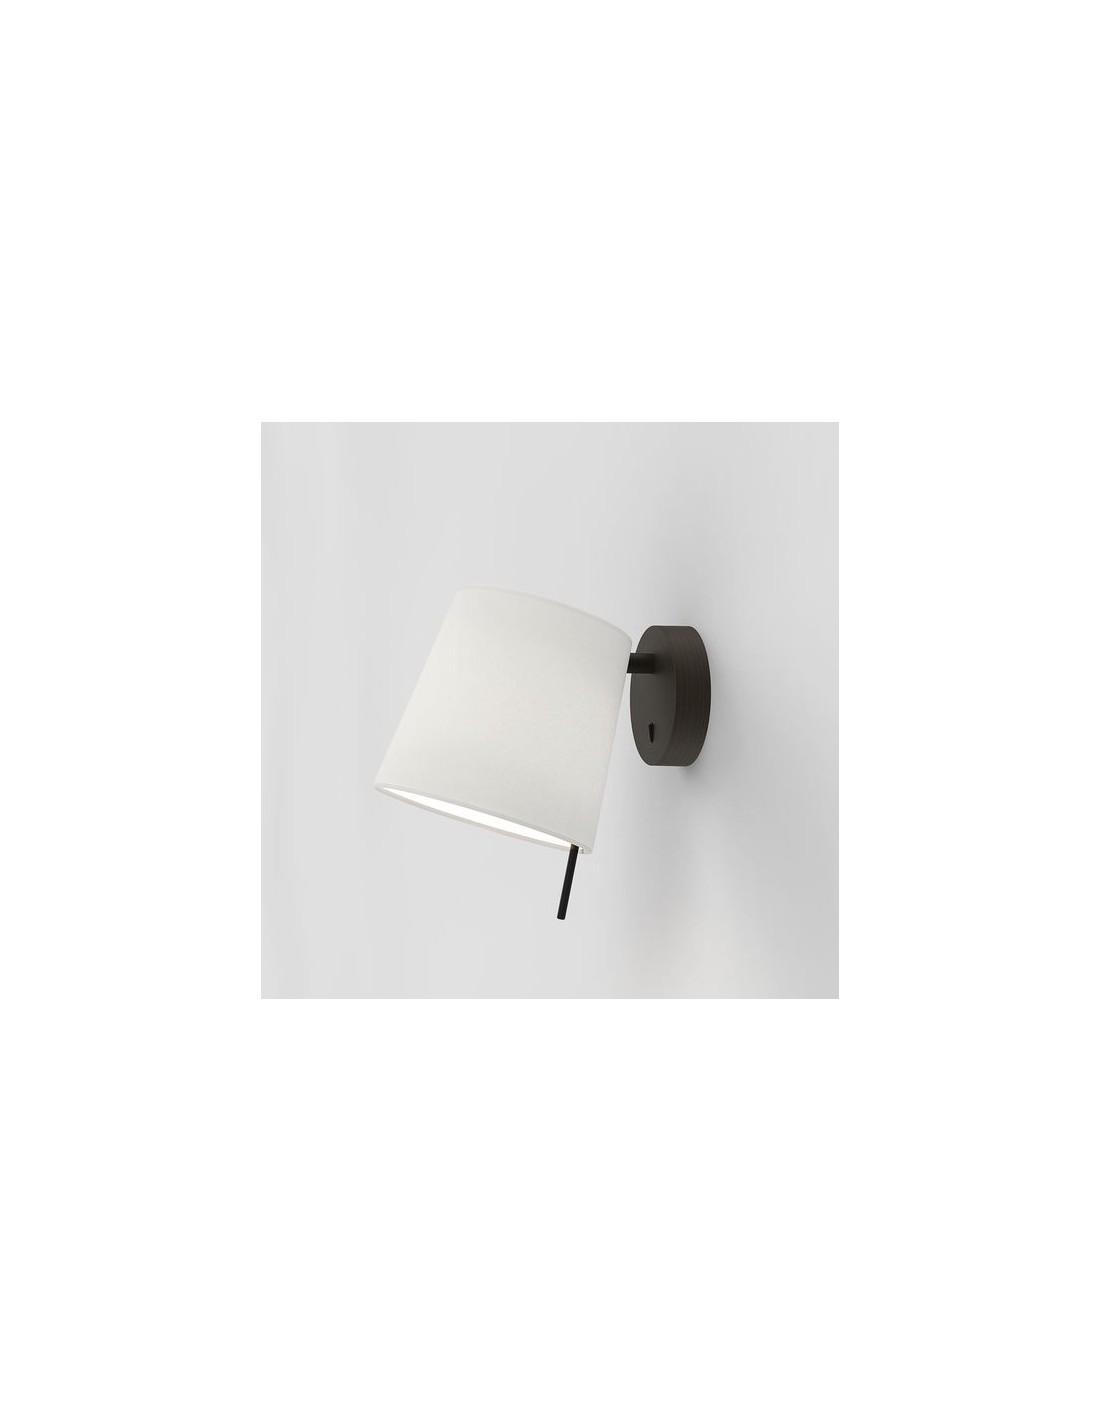 Applique Mitsu Wall bronze abat-jour blanc astro lighting- Valente design